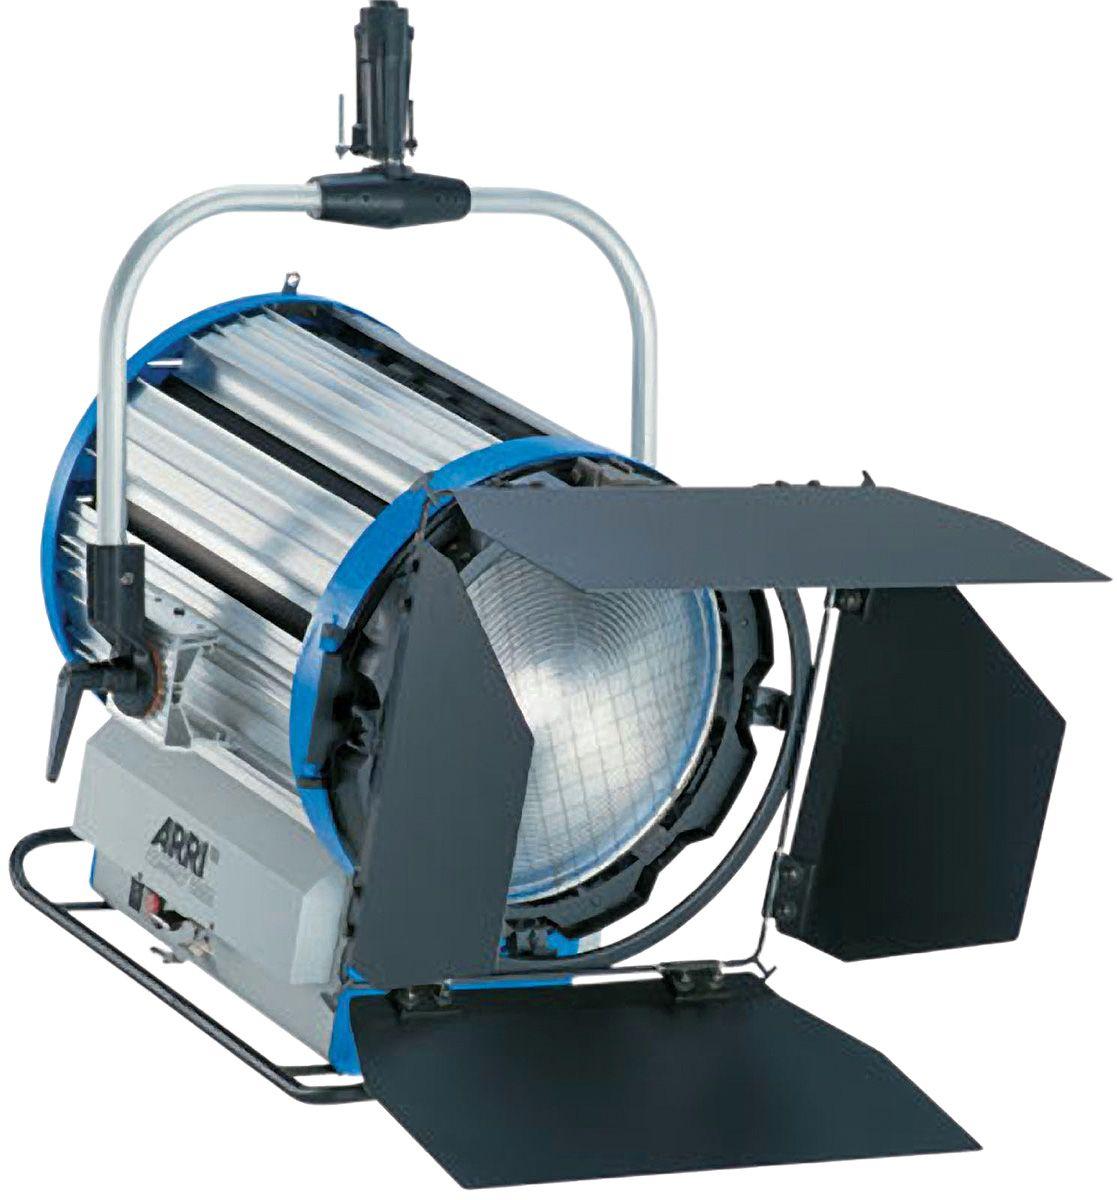 Studio Lighting Rental: Photographic And Digital Equipment Rental Cape